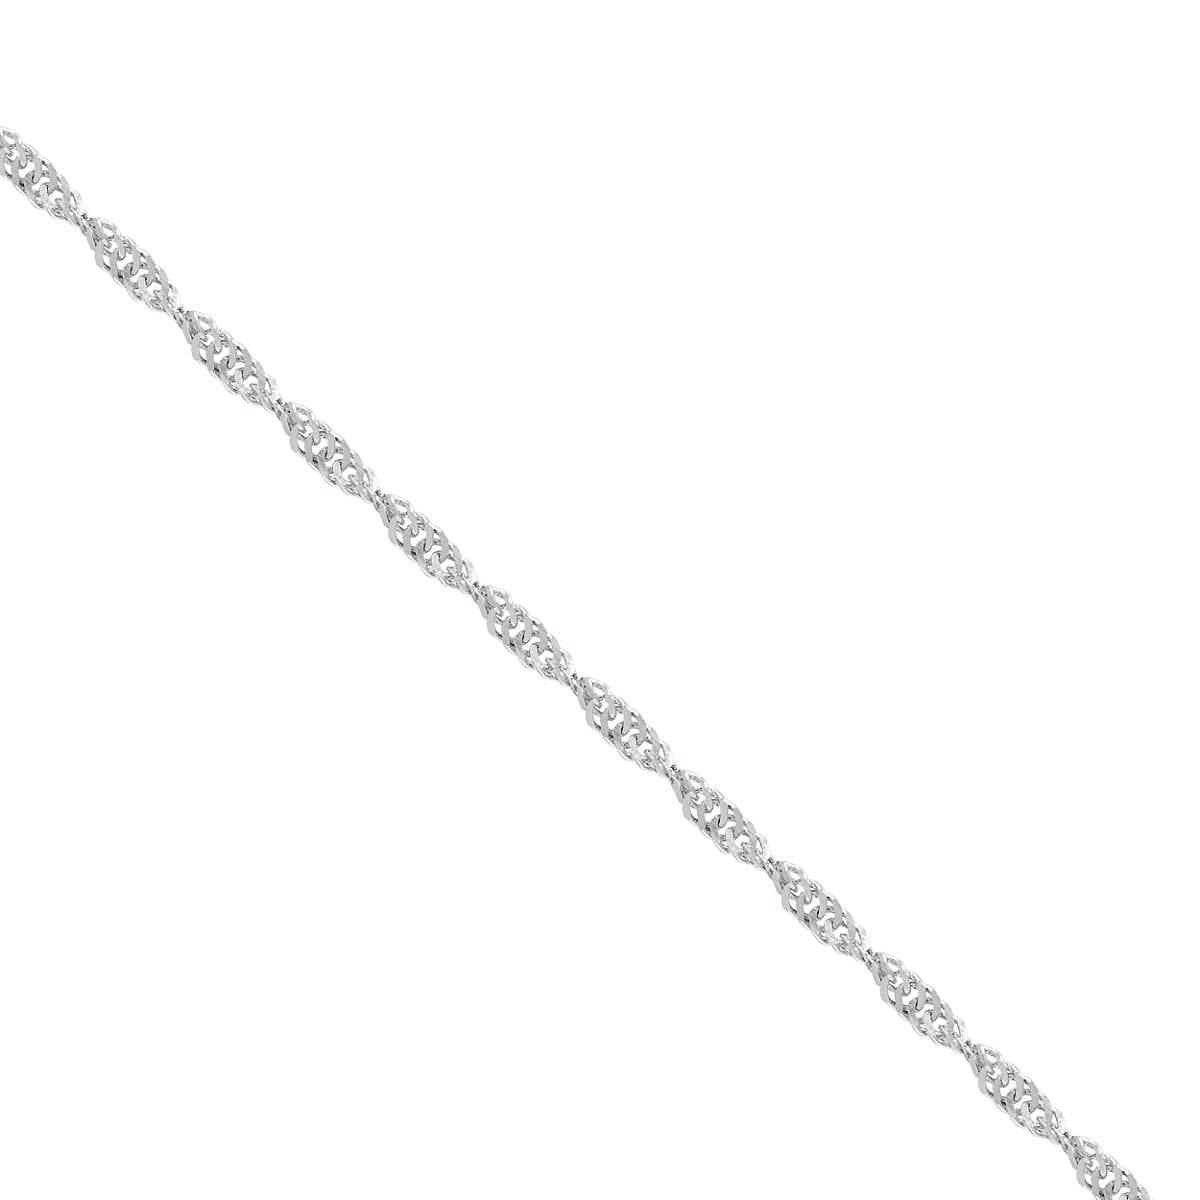 singapore-chain-silver